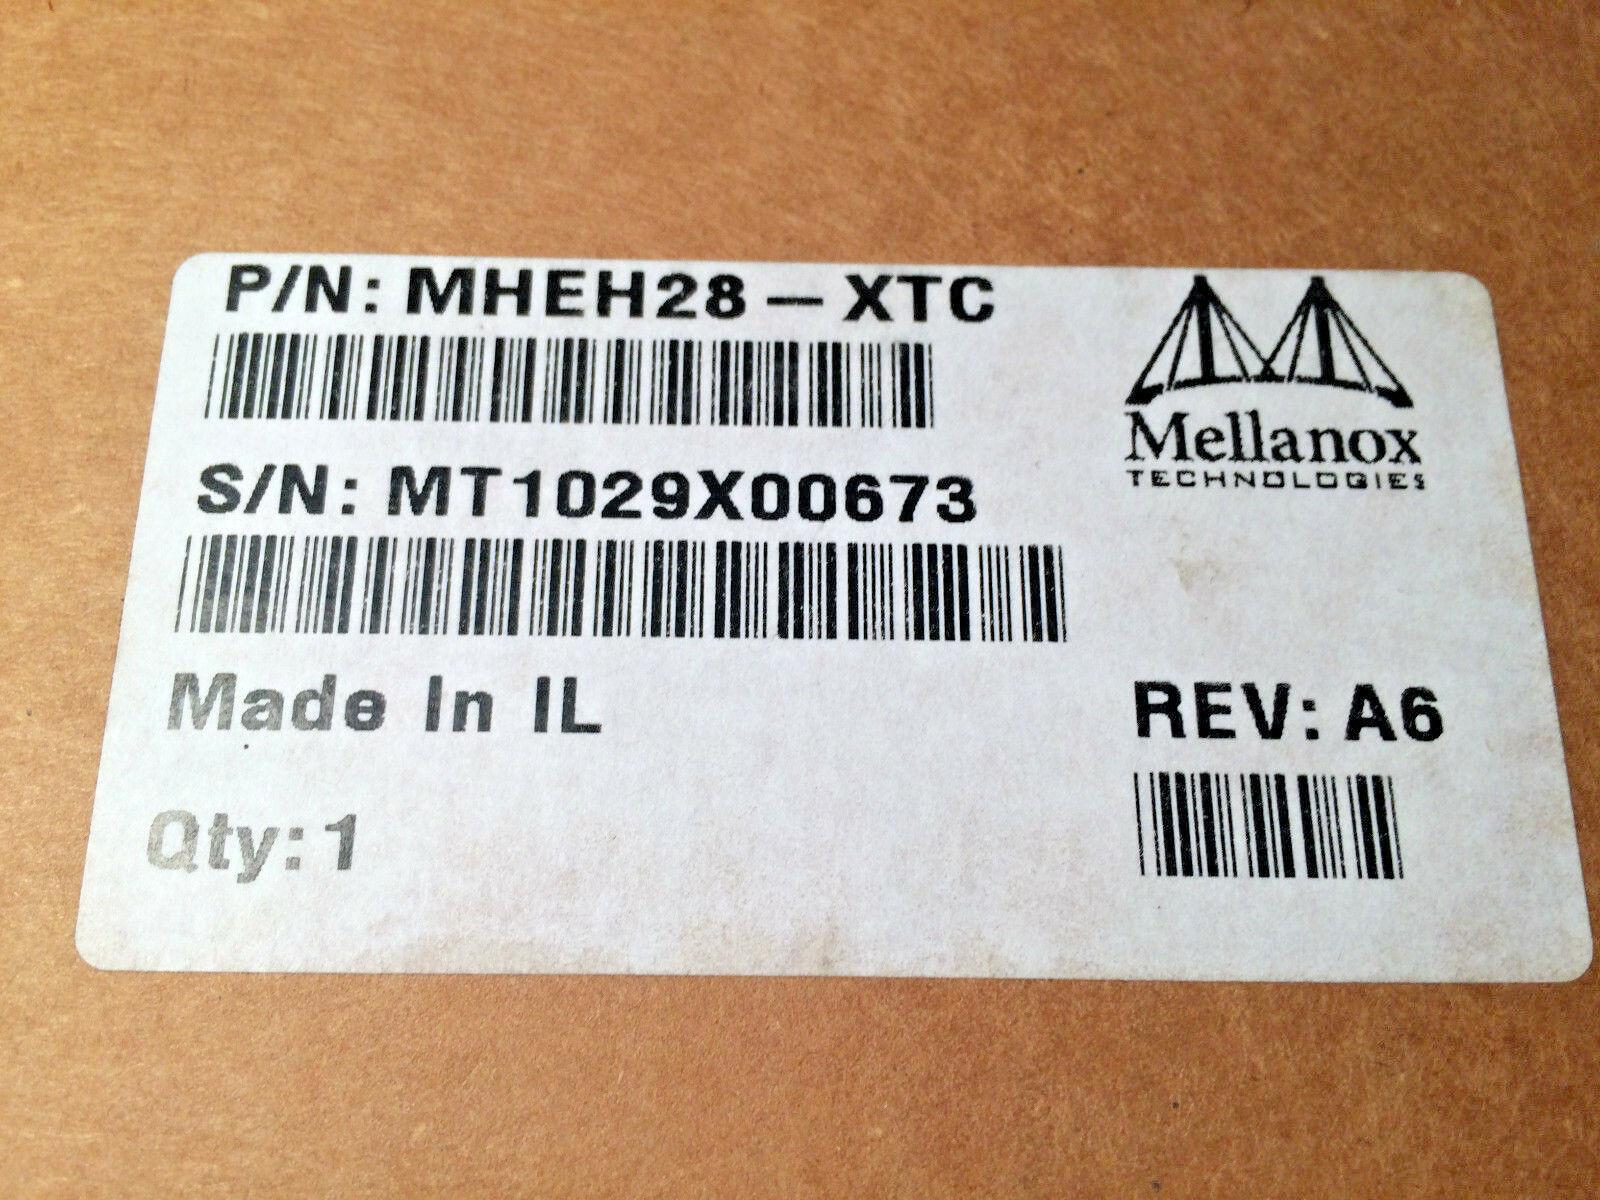 InfiniBand Mellanox MHEH28-XTC Dual Port HCA Card Rev A6 New image 2